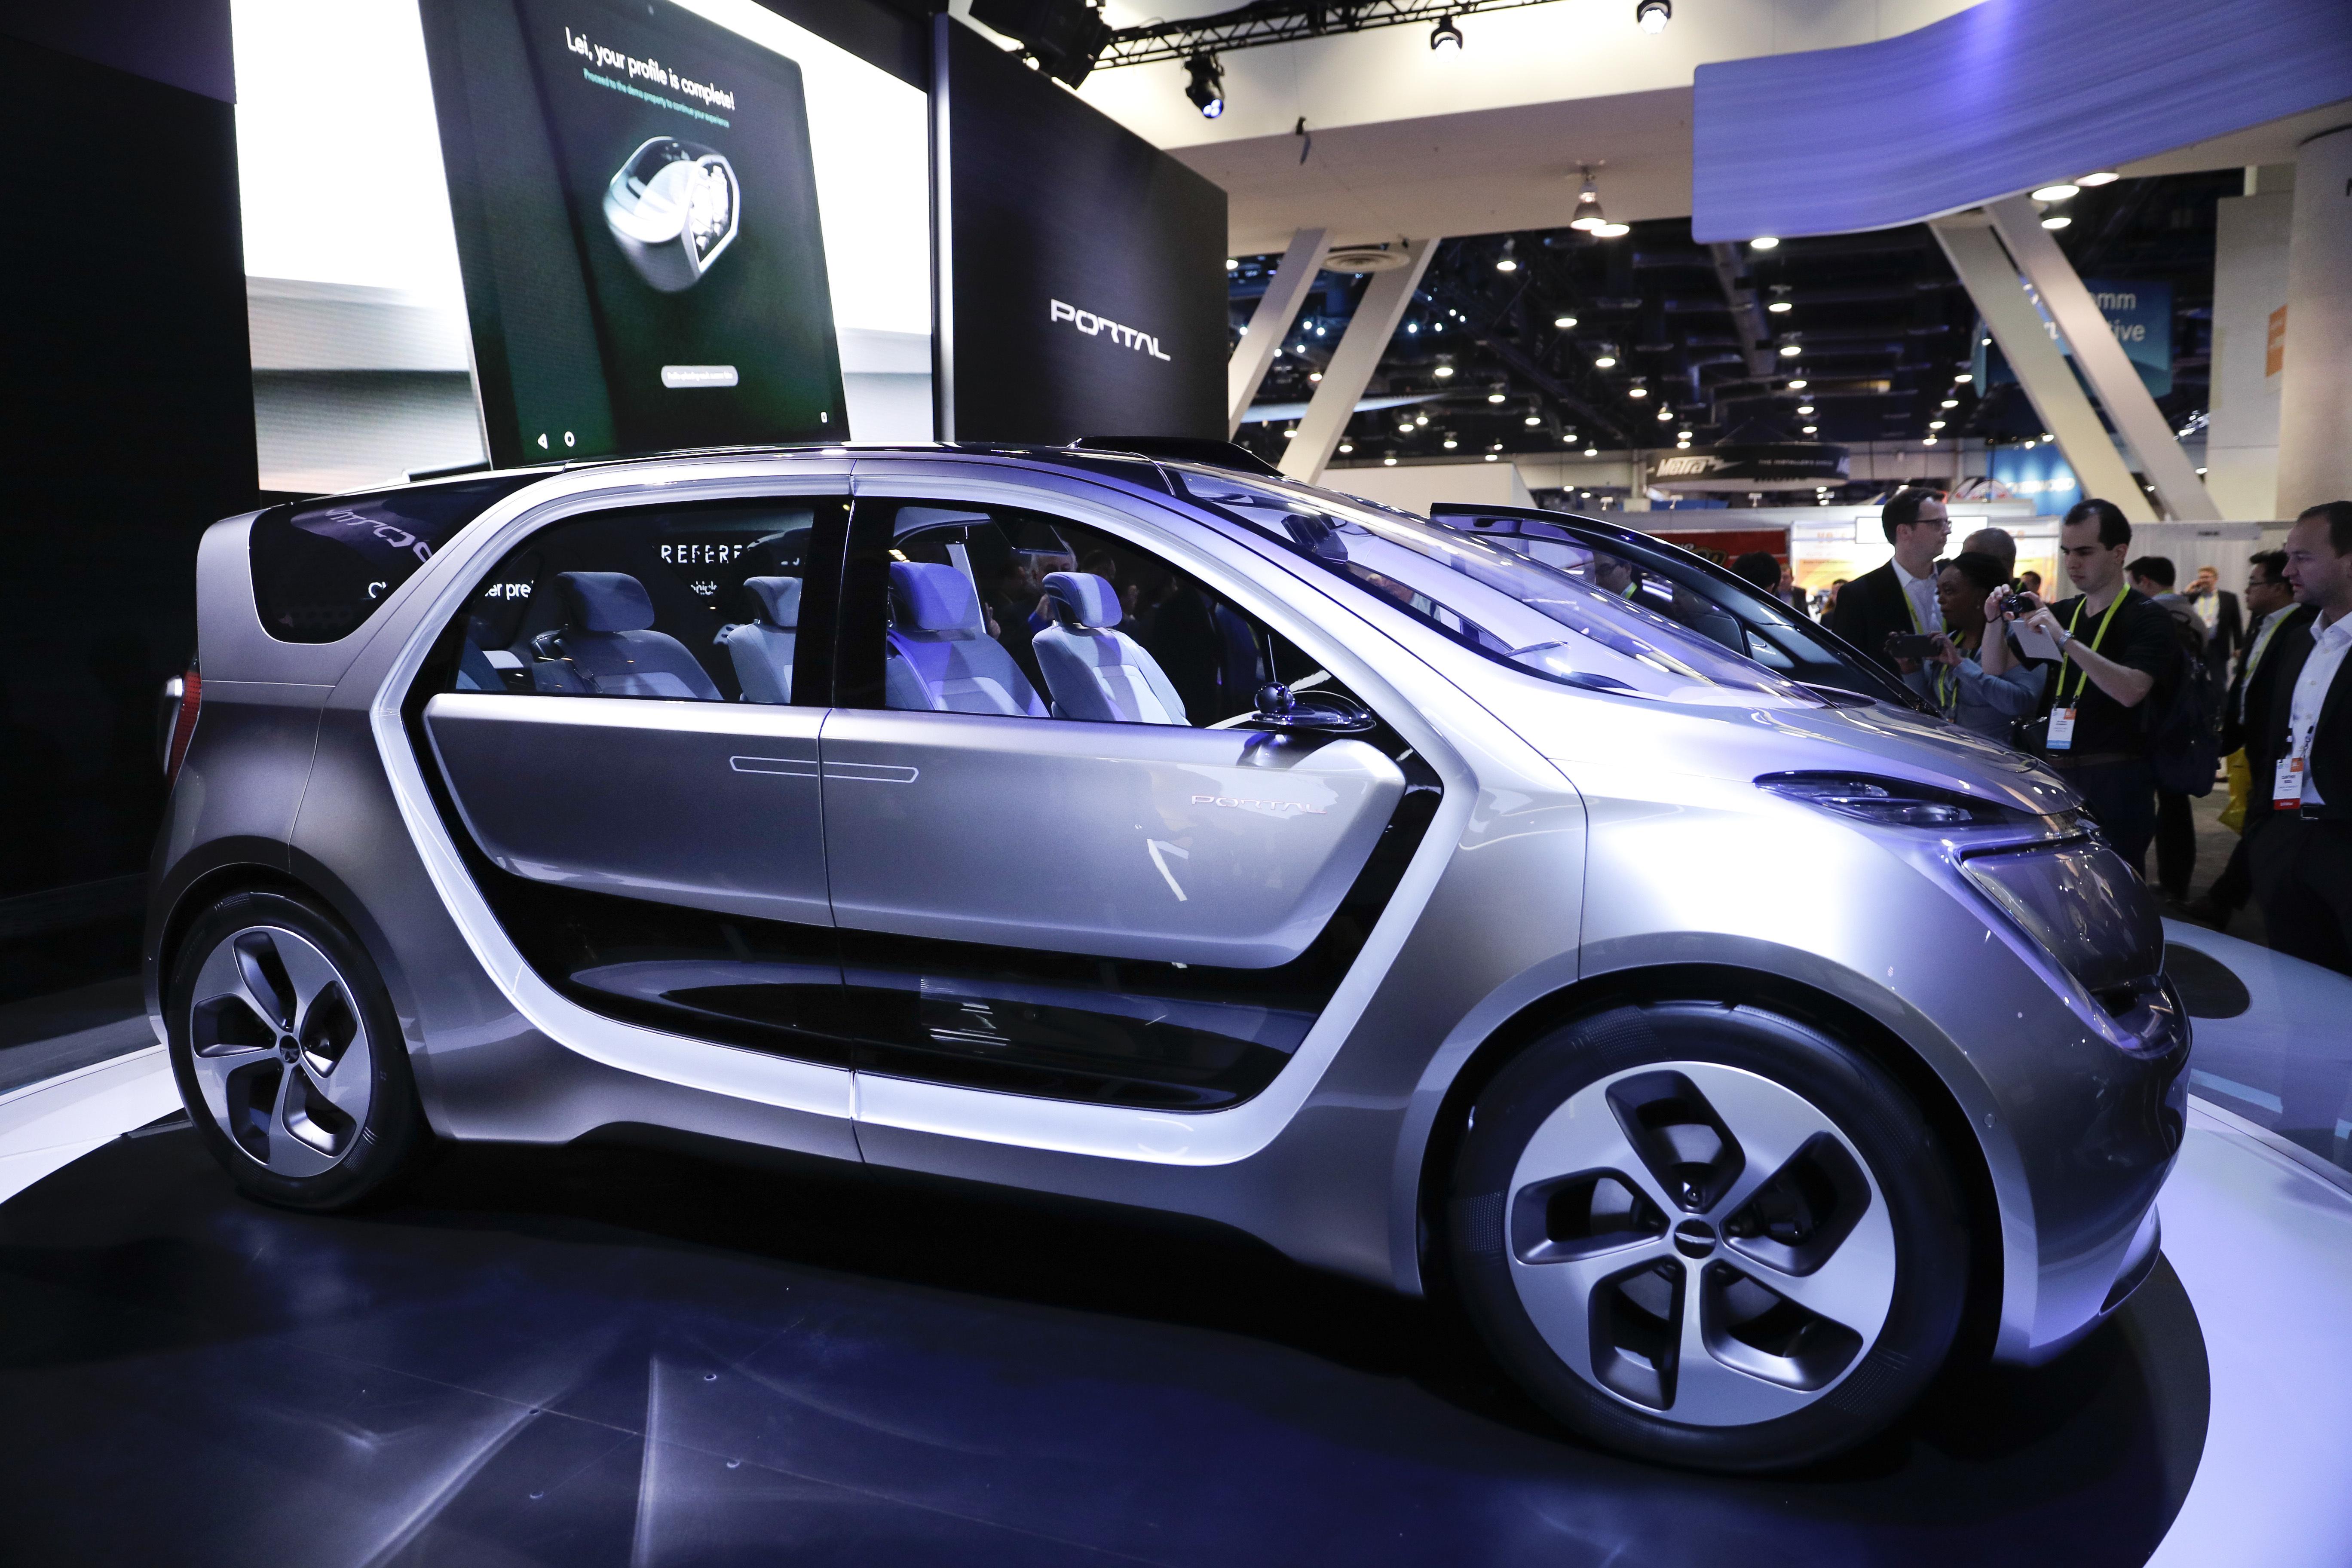 Futuristic car on display (© AP Images)